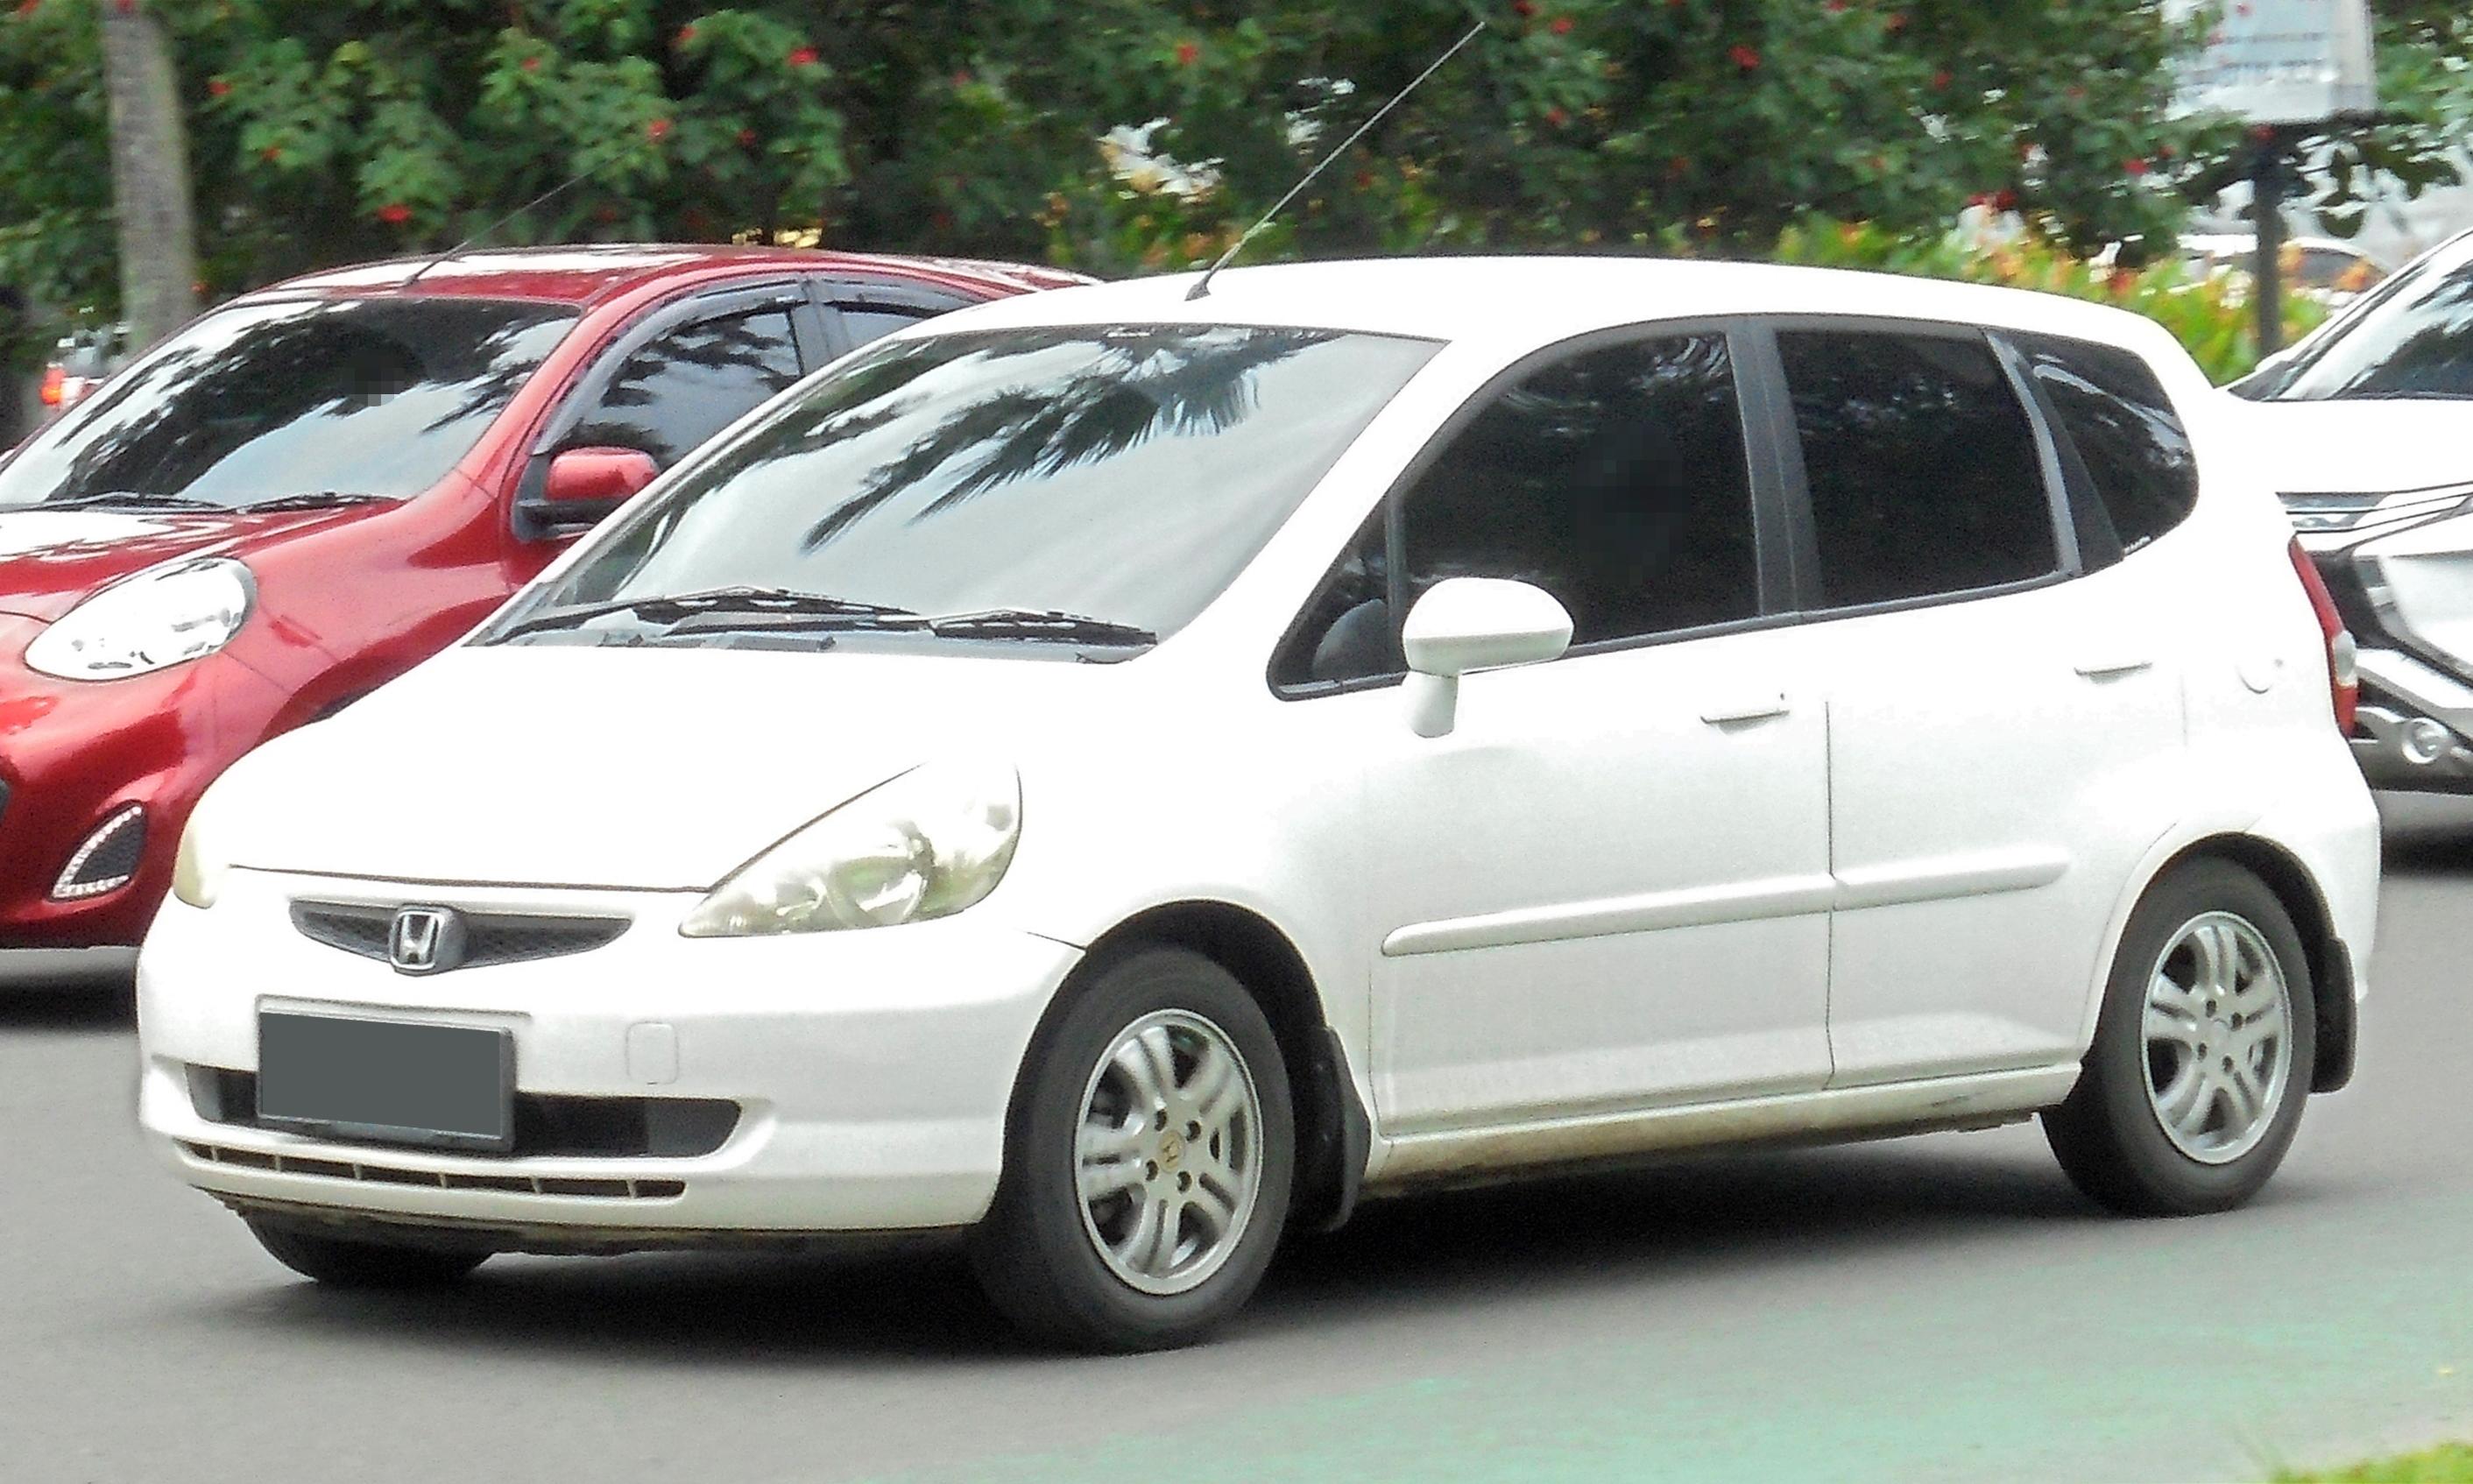 Kekurangan Honda Jazz 2005 Murah Berkualitas